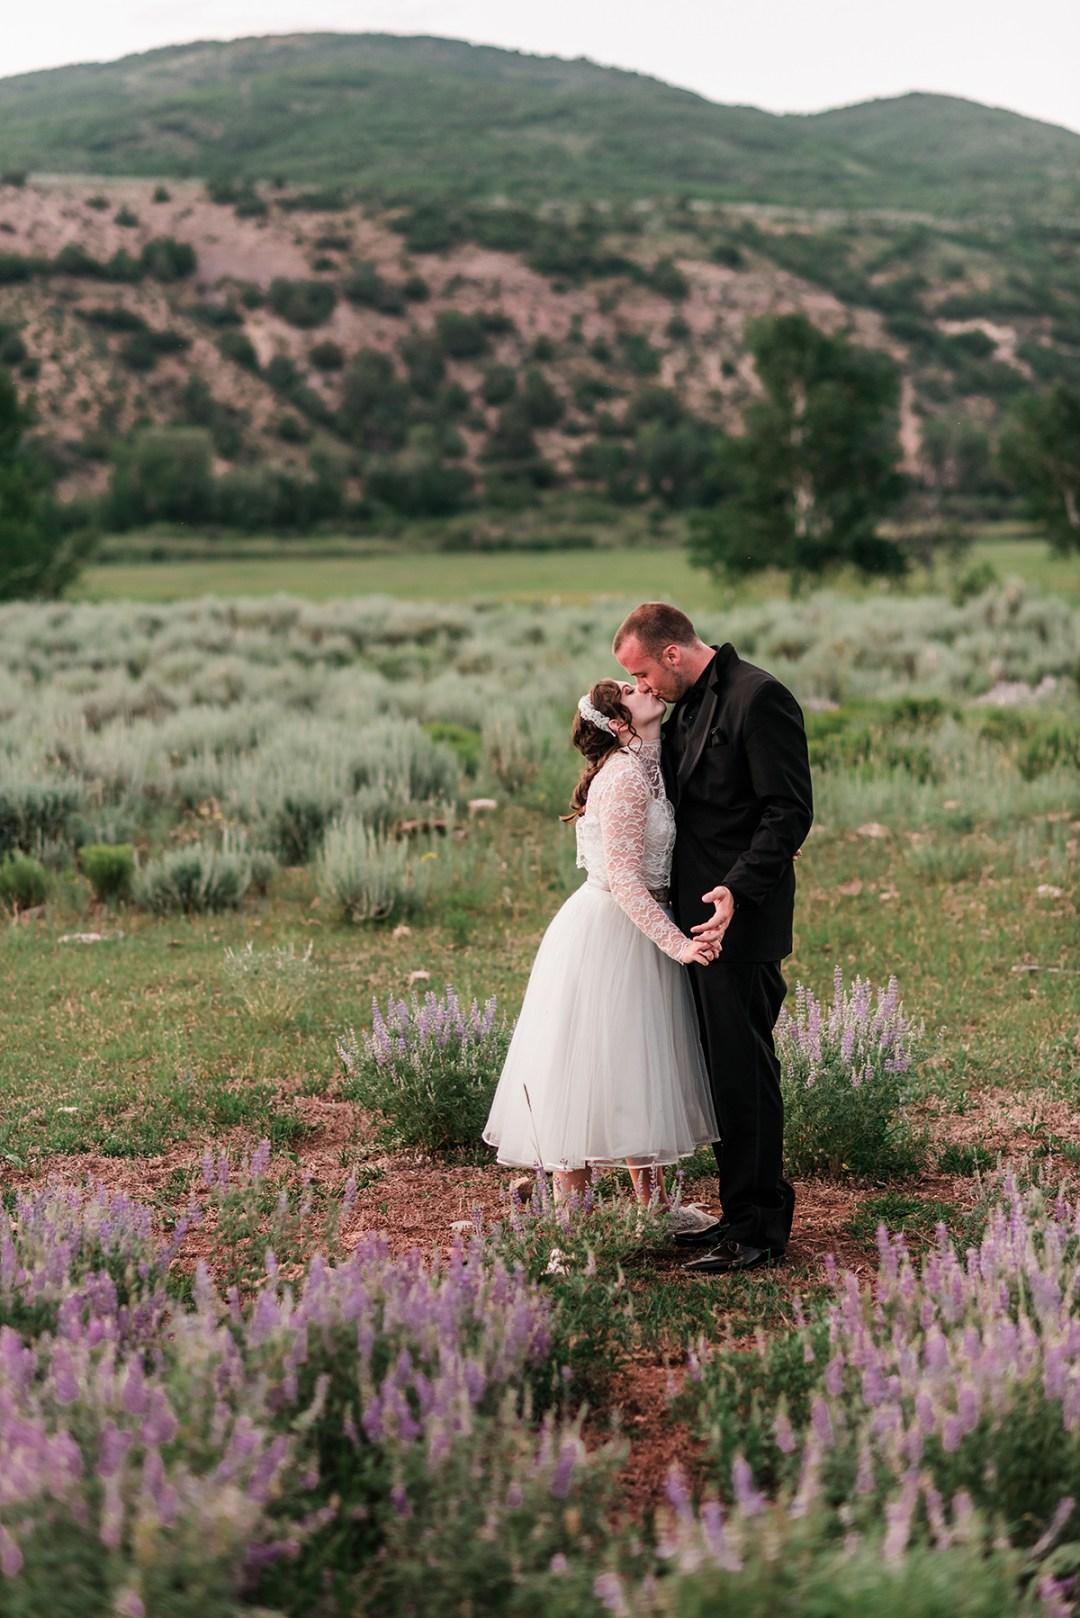 Josh & Annie in a field of purple lupine at Rolling R Ranch near Meeker